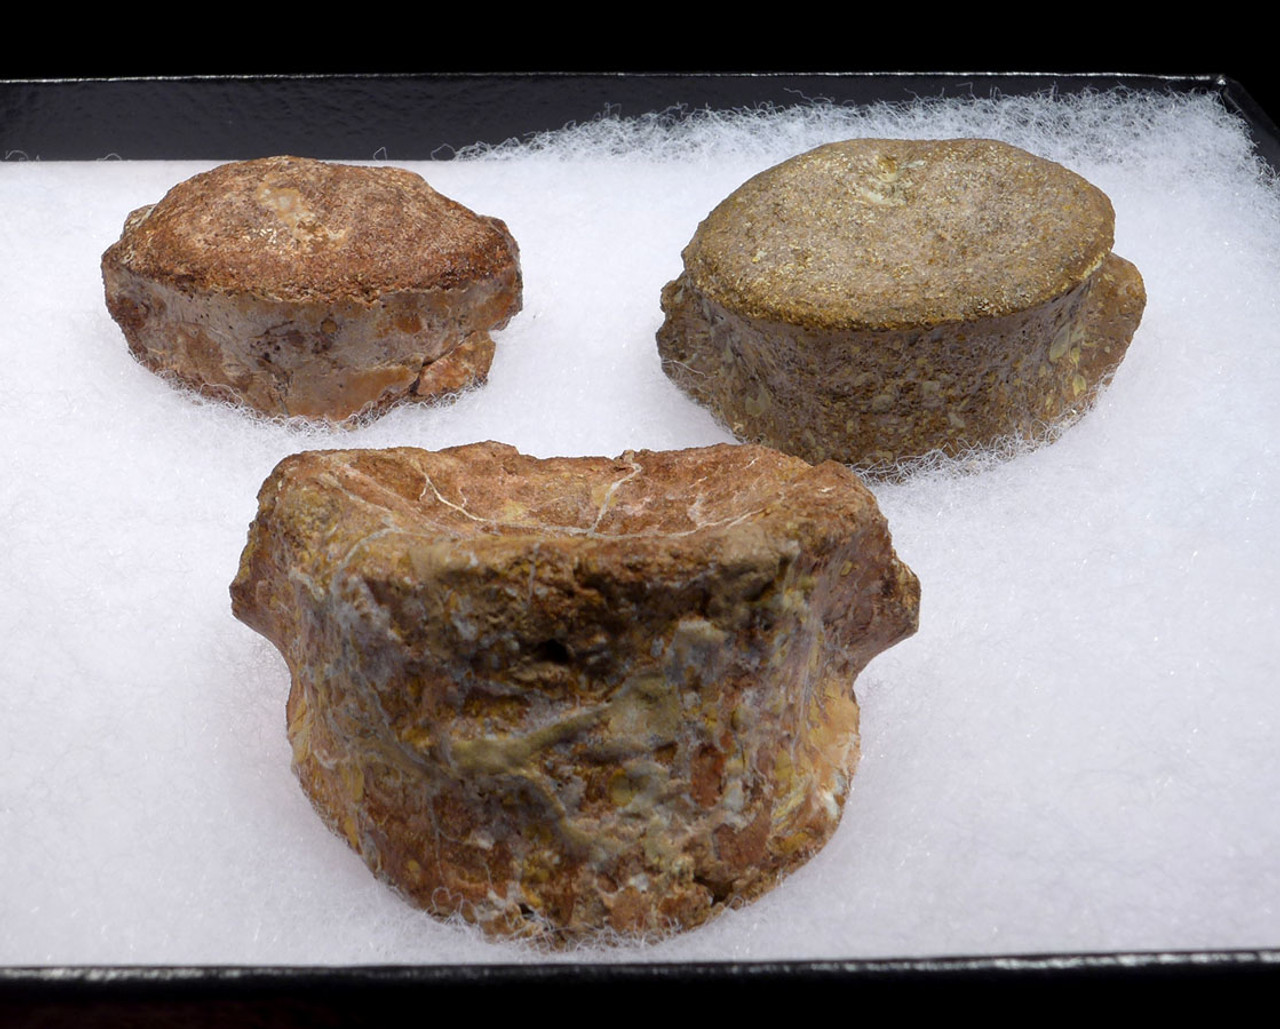 RARE SET OF 3 GIANT METOPOSAURUS AMPHIBIAN FOSSIL VERTEBRAE FROM THE TRIASSIC *MVX99